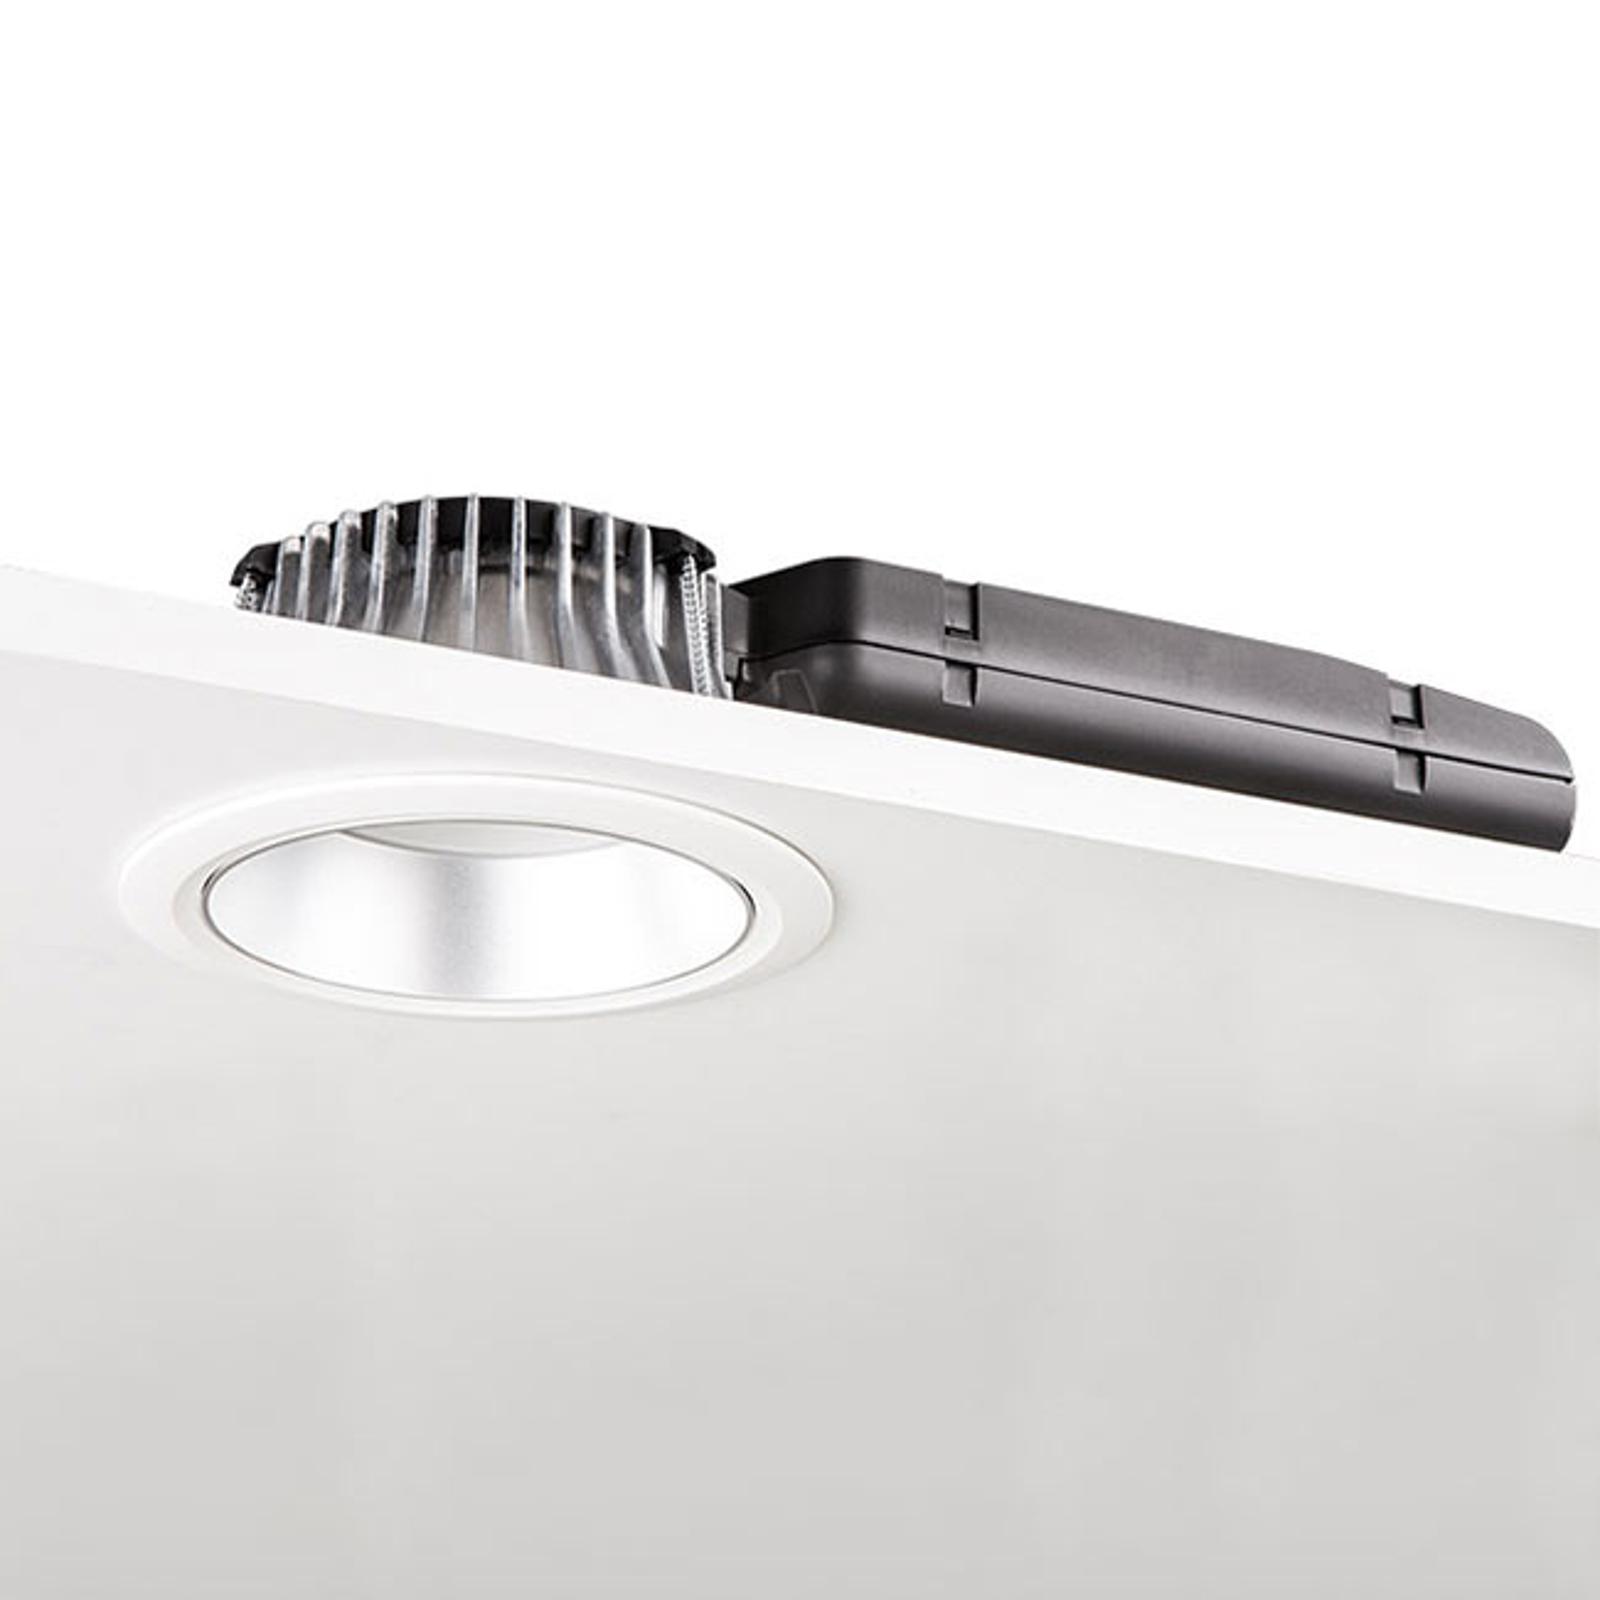 Downlight LED D70-RF155 HF 3000K blanc/argent mat